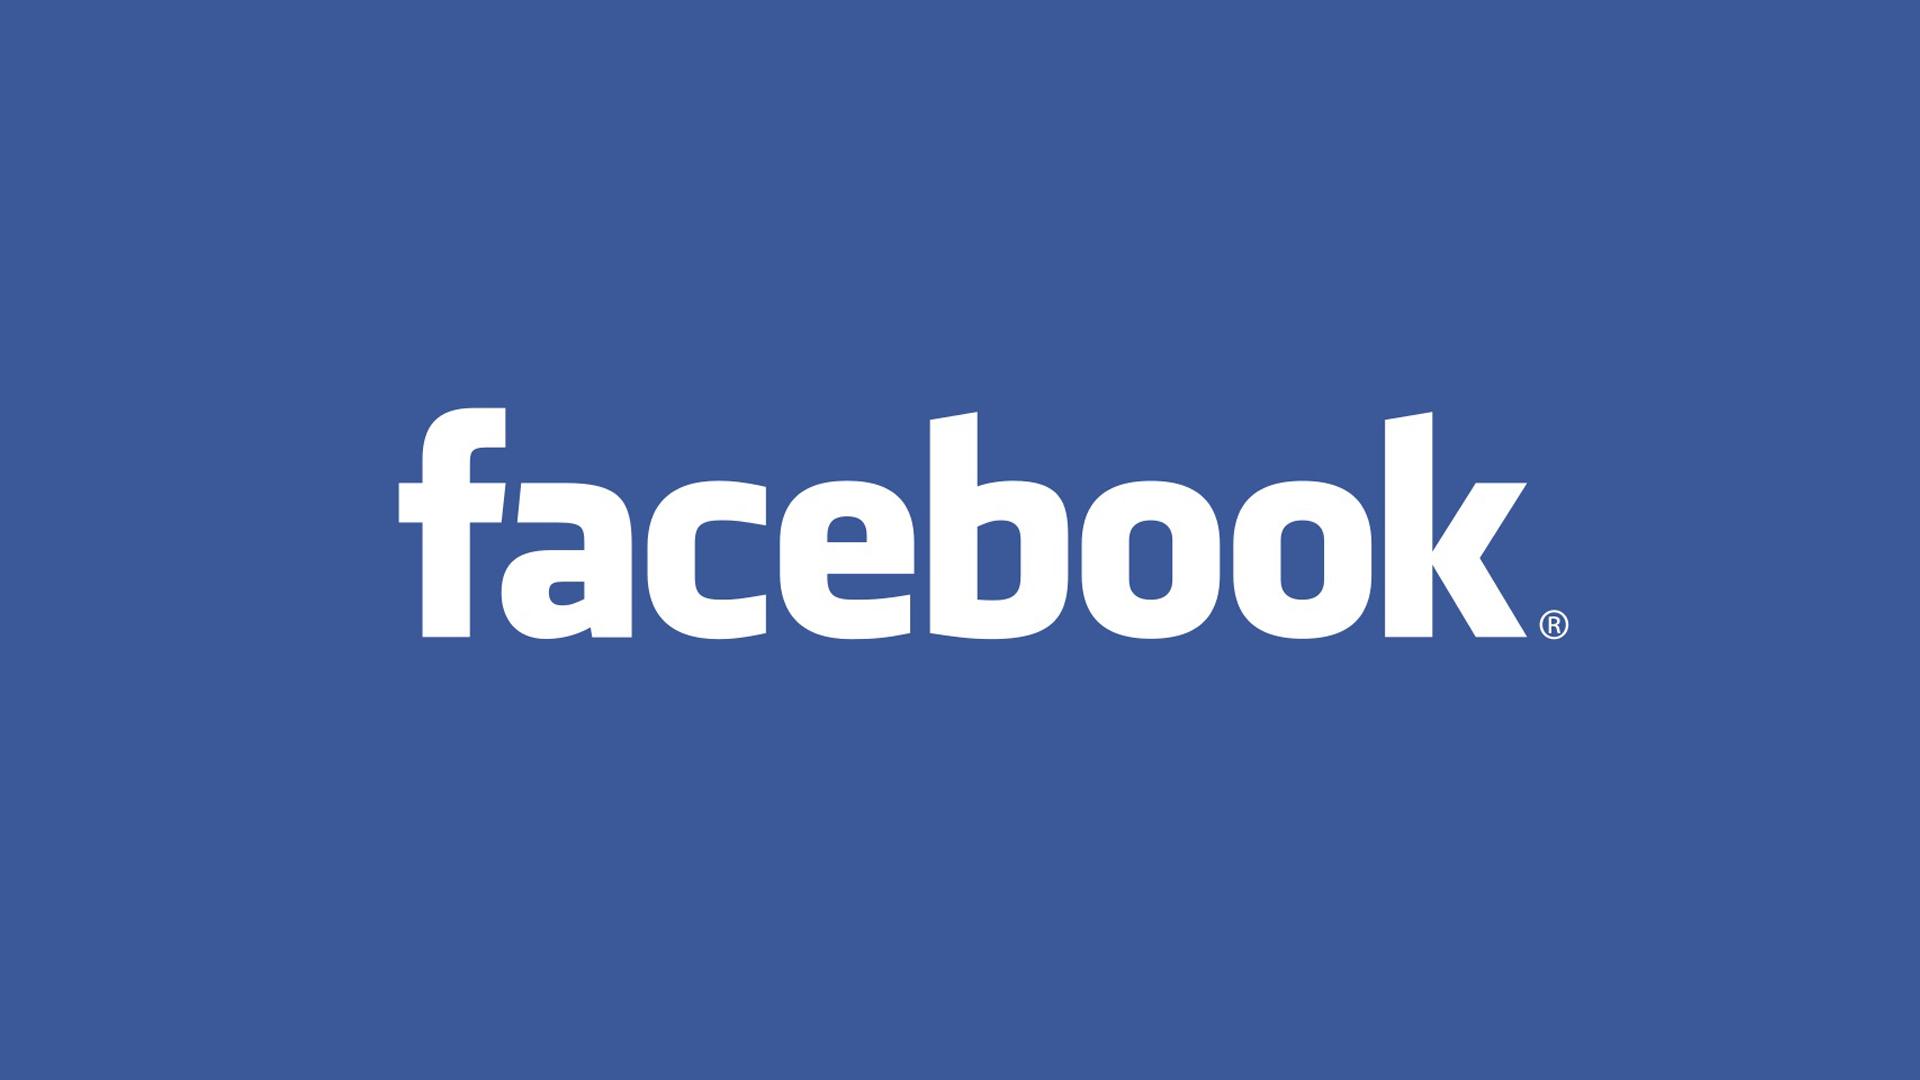 Facebook simplifies cross-posting across its apps